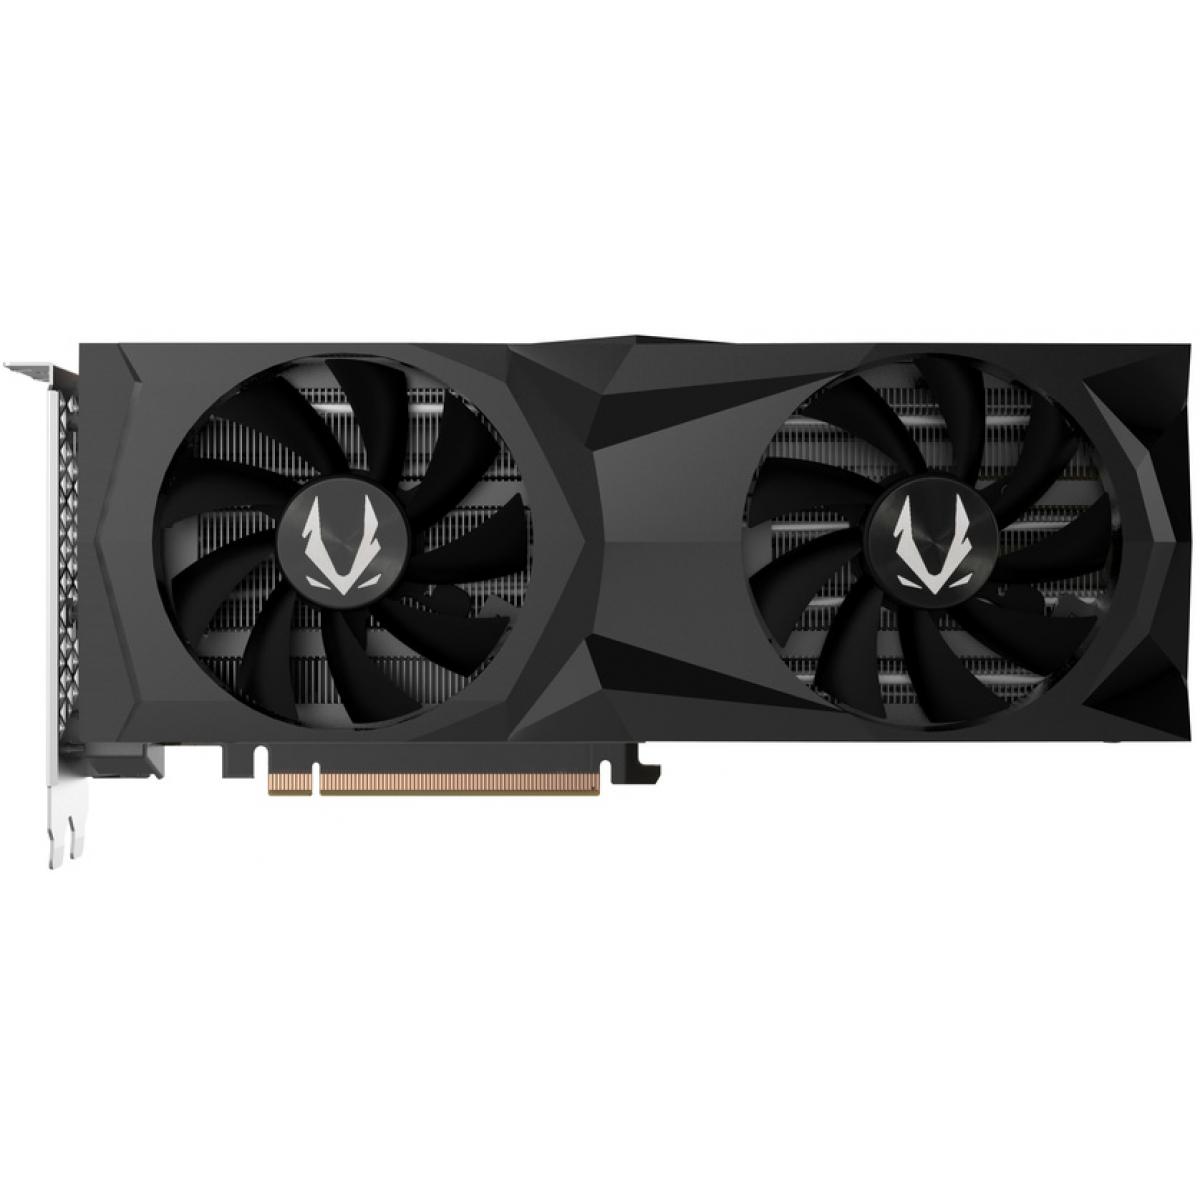 Placa de Vídeo Zotac GeForce RTX 2060 Super Gaming AMP Dual, 8GB GDDR6, 256Bit, ZT-T20610D-10P